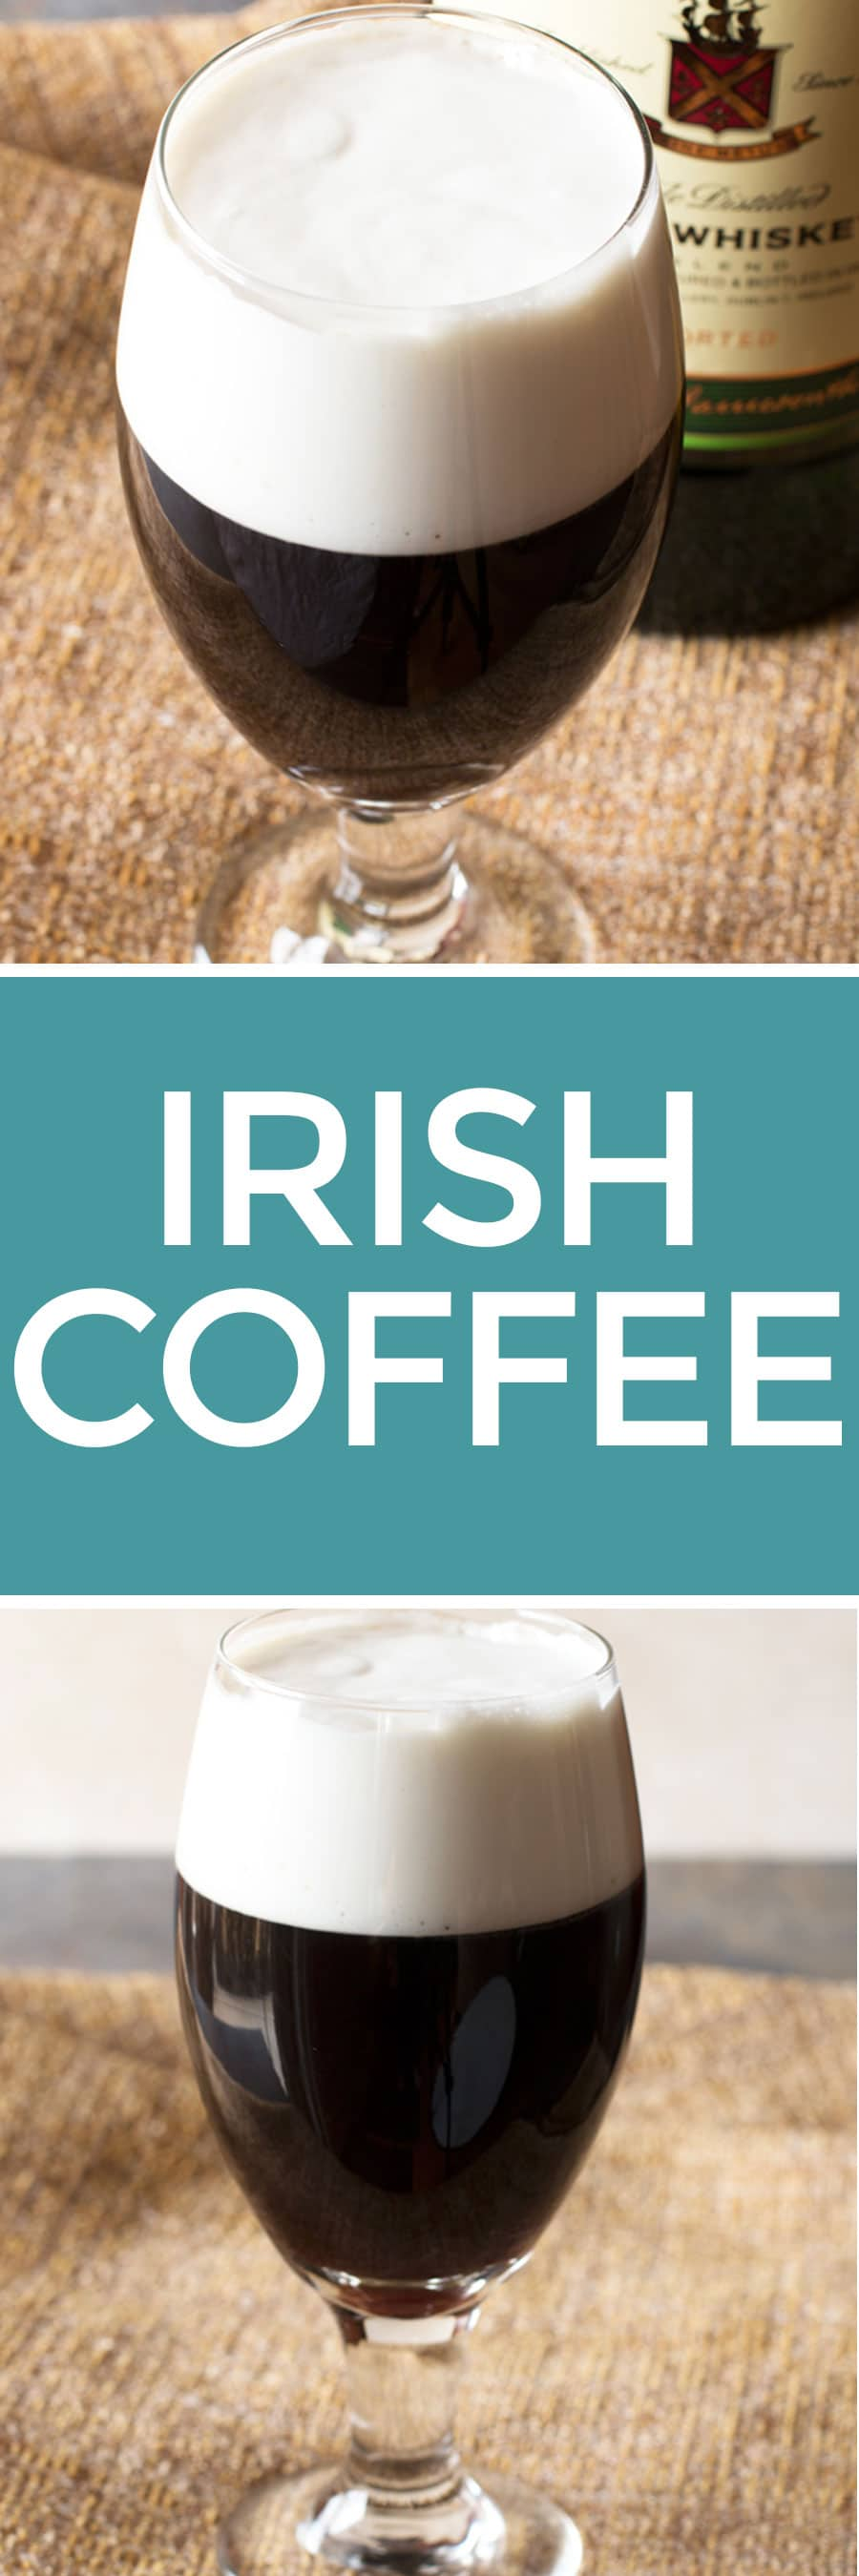 Irish Coffee | cakenknife.com #appetizer #beef #snack #stpatricksday